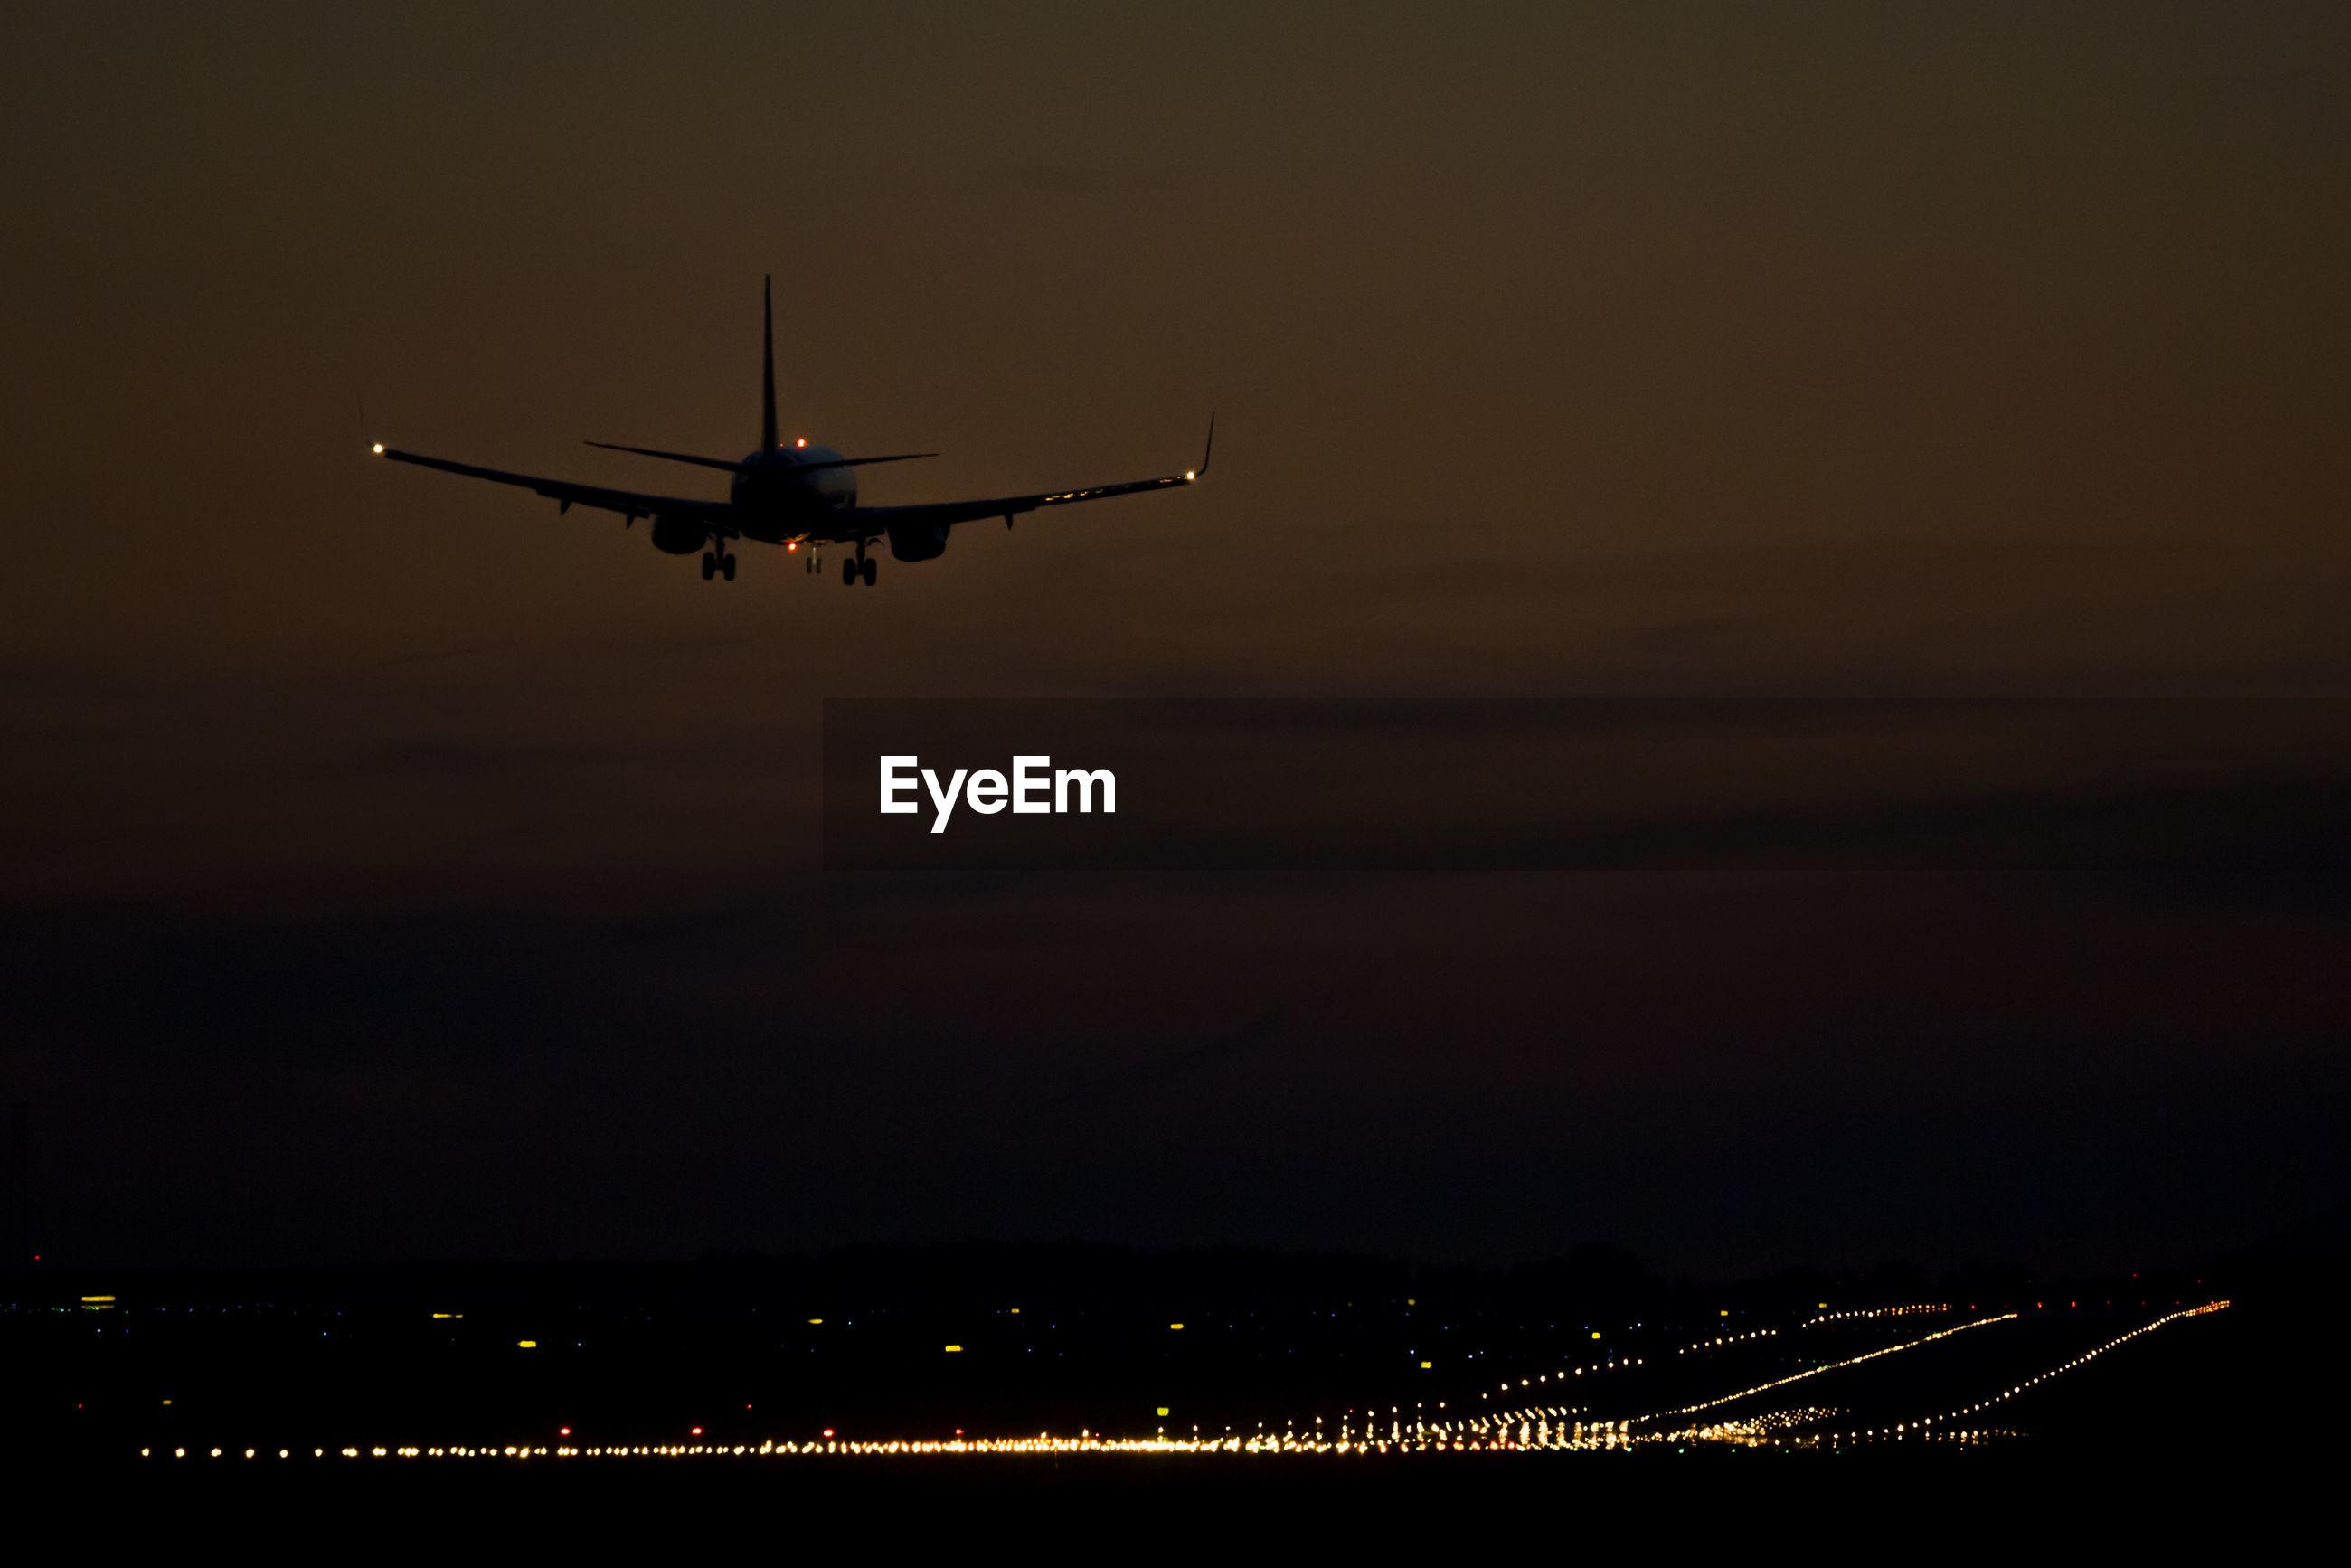 Silhouette airplane landing on illuminated runway at night